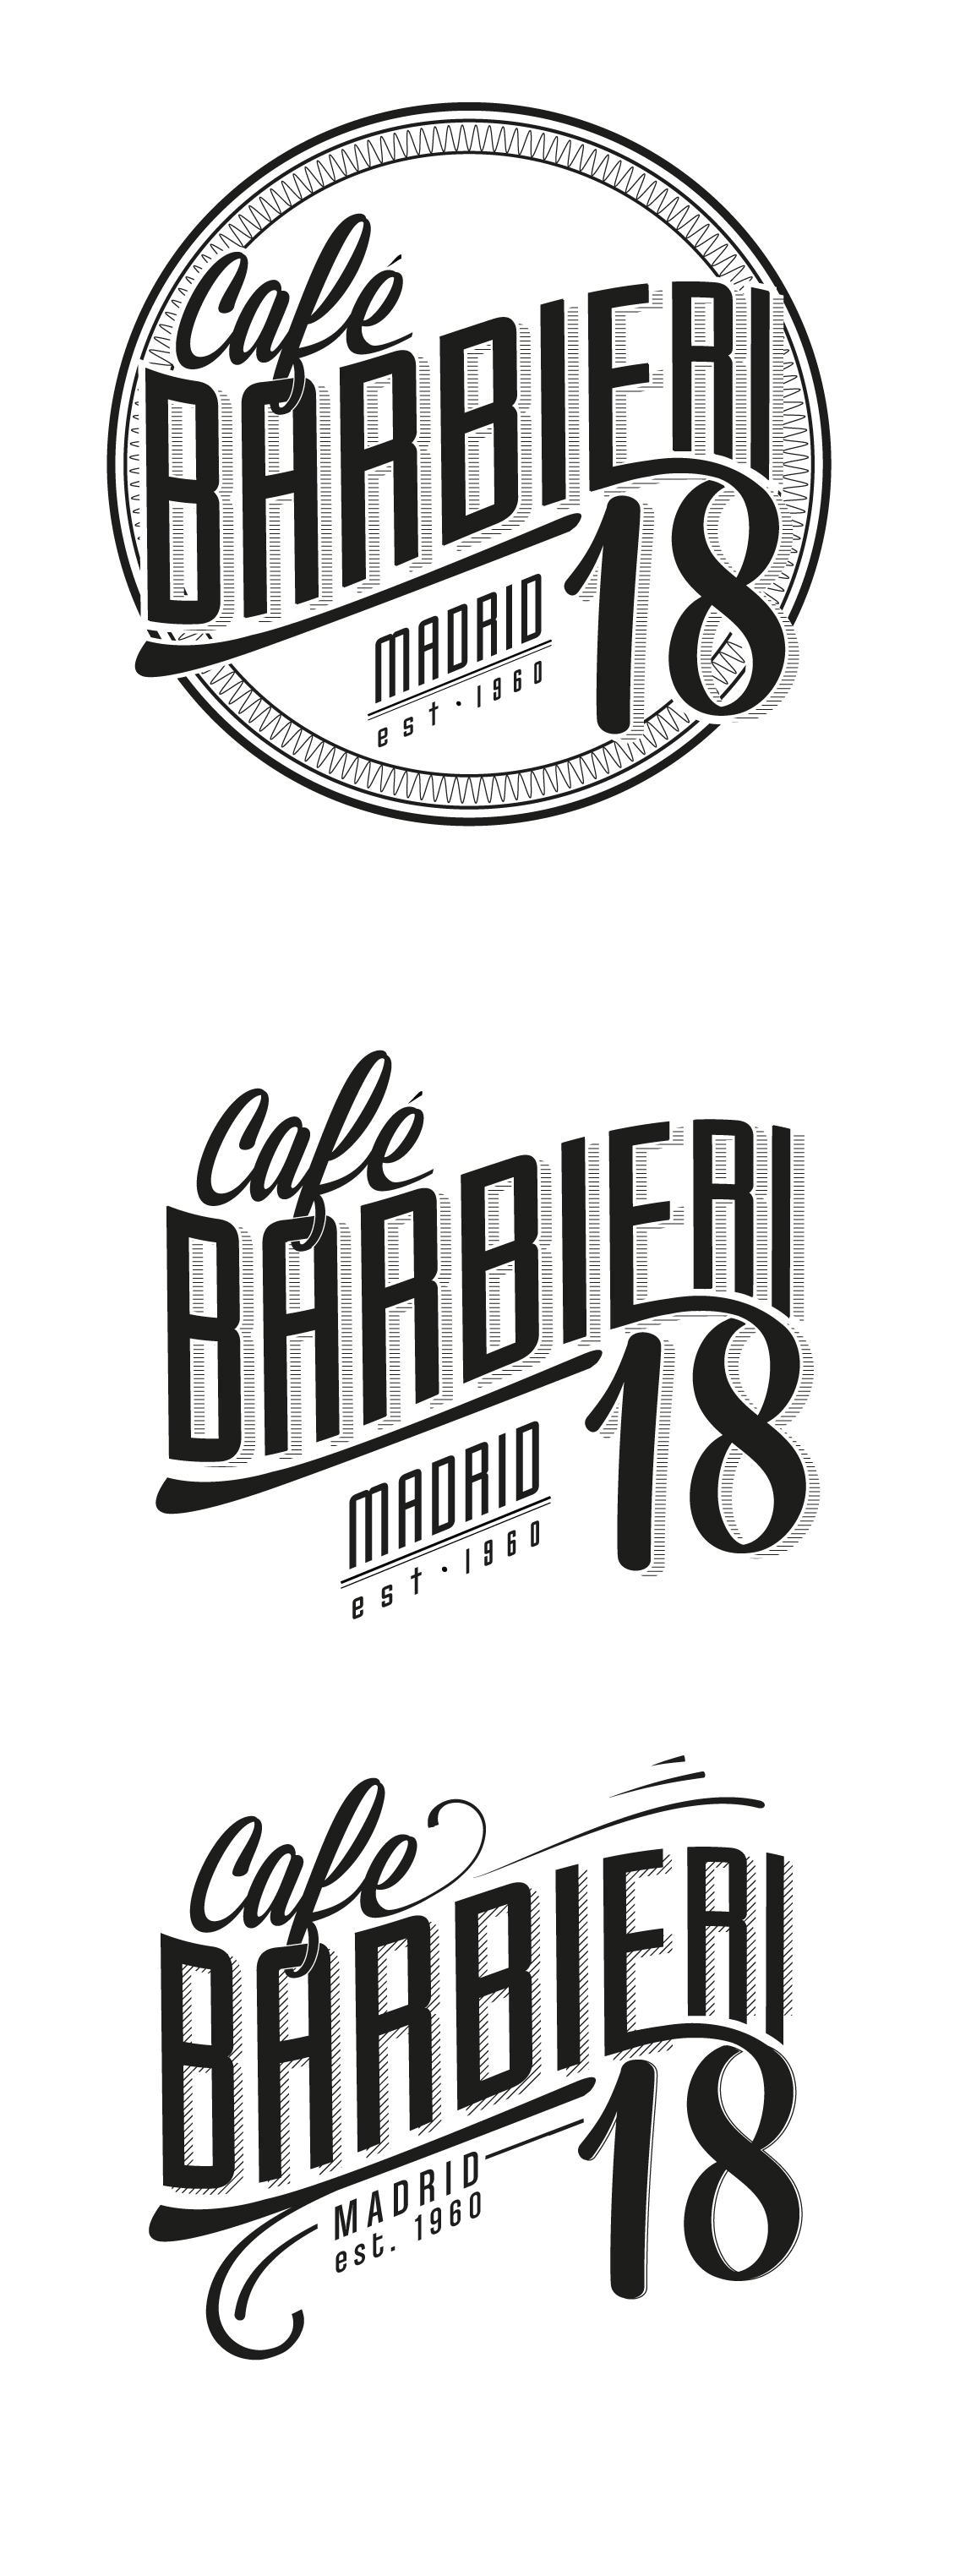 BARBIERI 18 - image 4 - student project